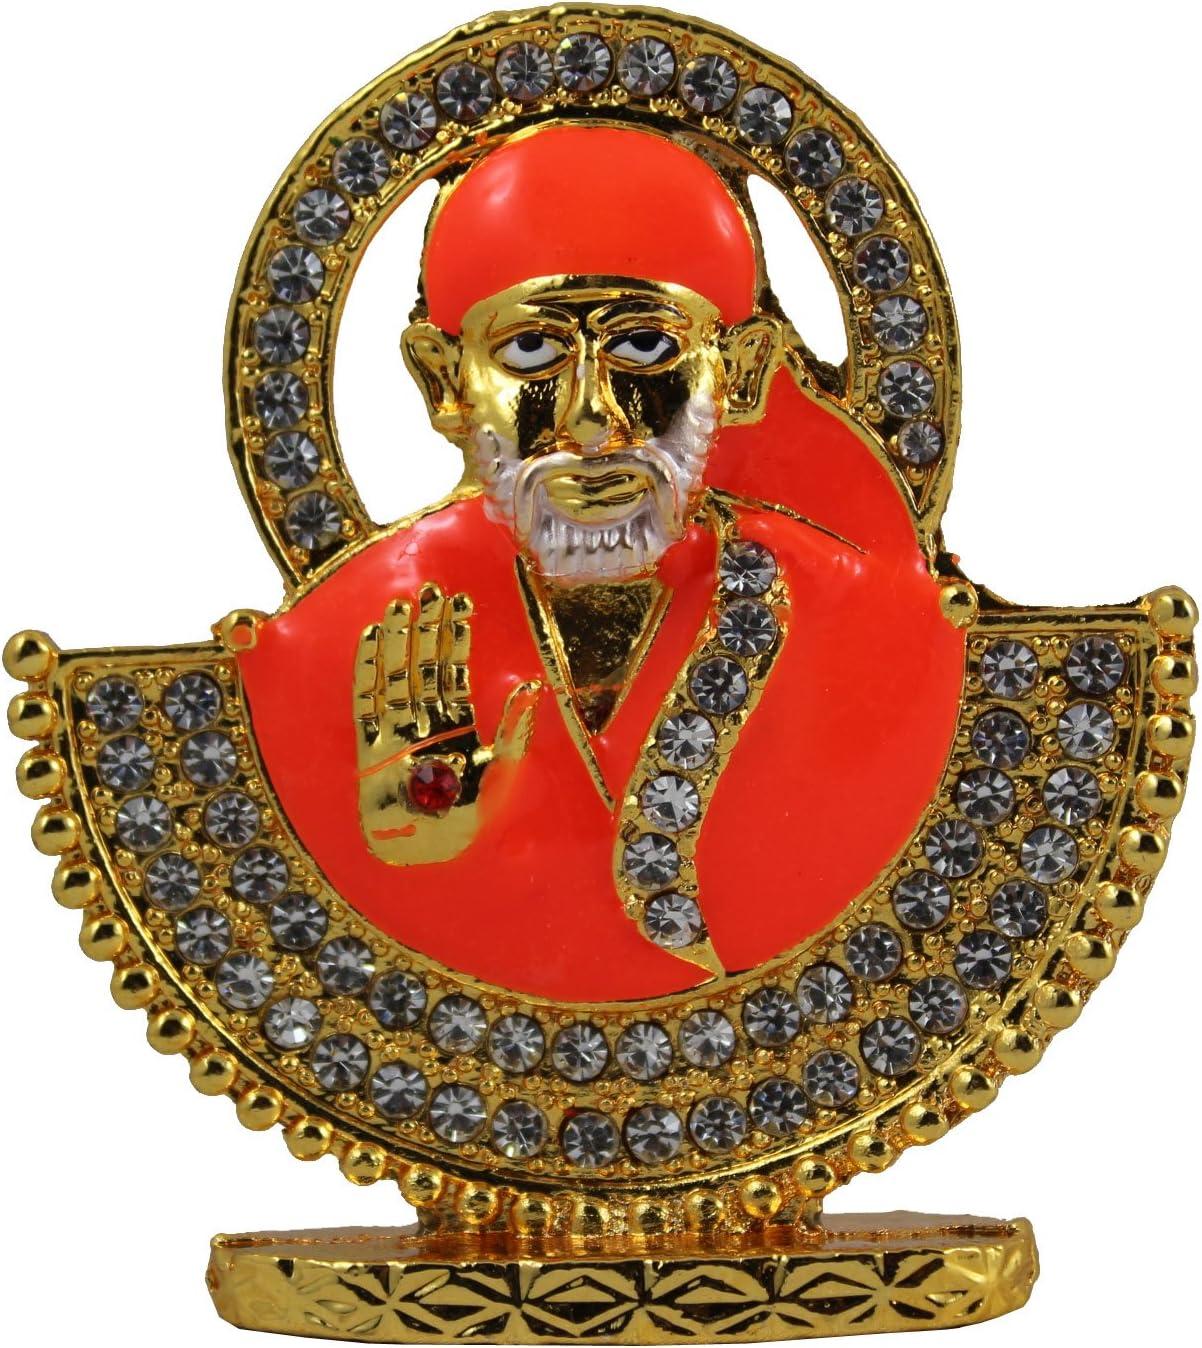 Odishabazaar Idol for Car Dashboard / Home / Office / Perfect Gift Item (pl-3157))